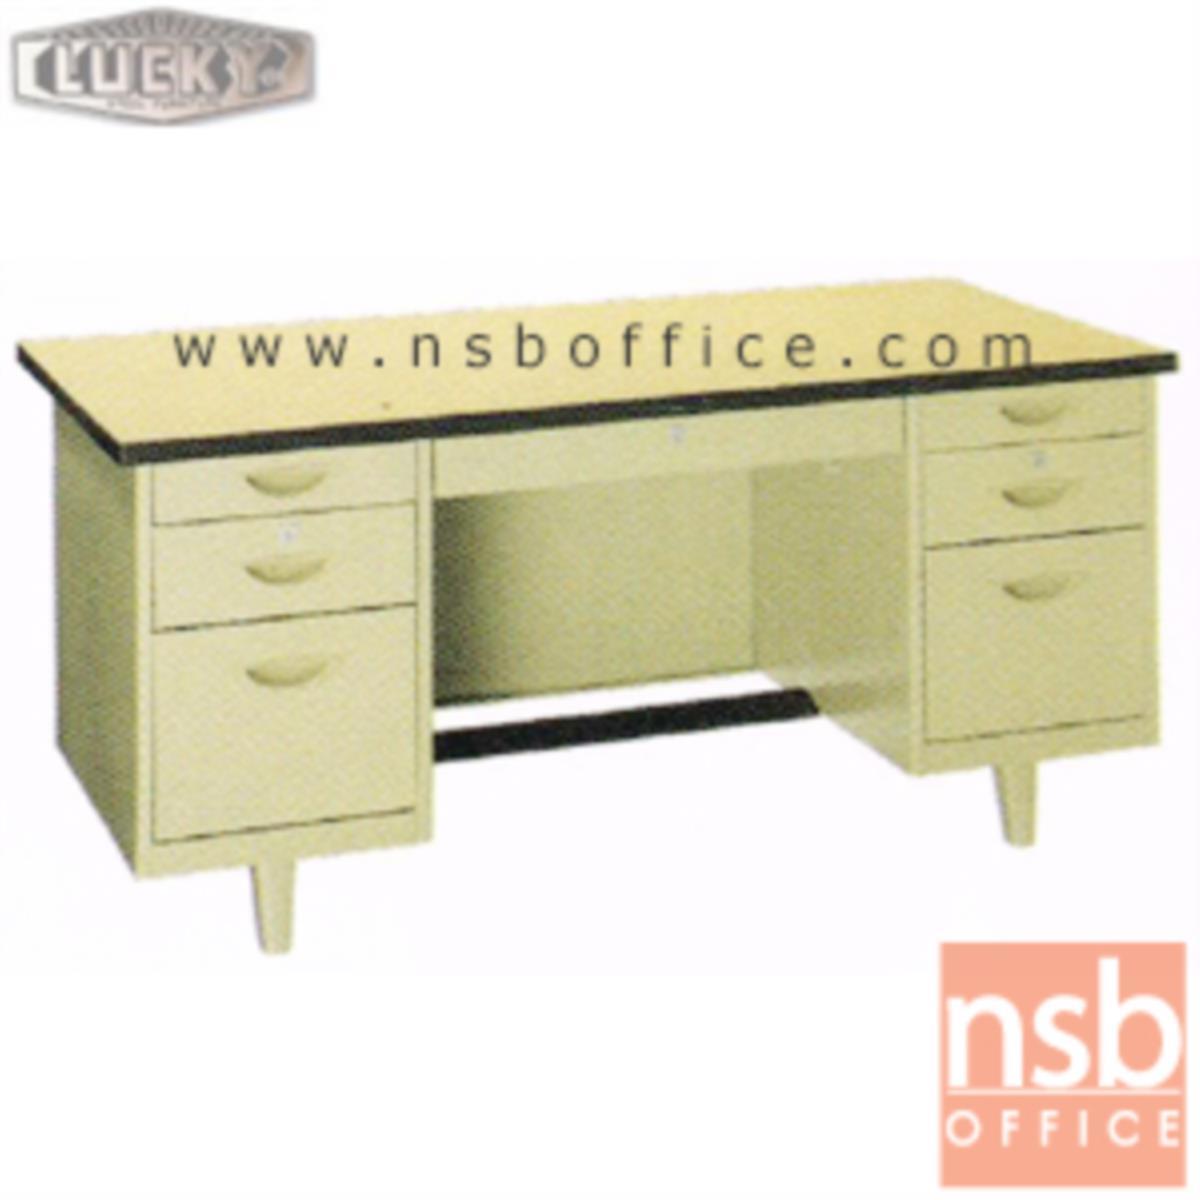 E28A103:โต๊ะทำงานเหล็กหน้าโฟเมก้า 7 ลิ้นชัก ยี่ห้อ Lucky  รุ่น NTN-2654,NTN-3060,NTN-3472